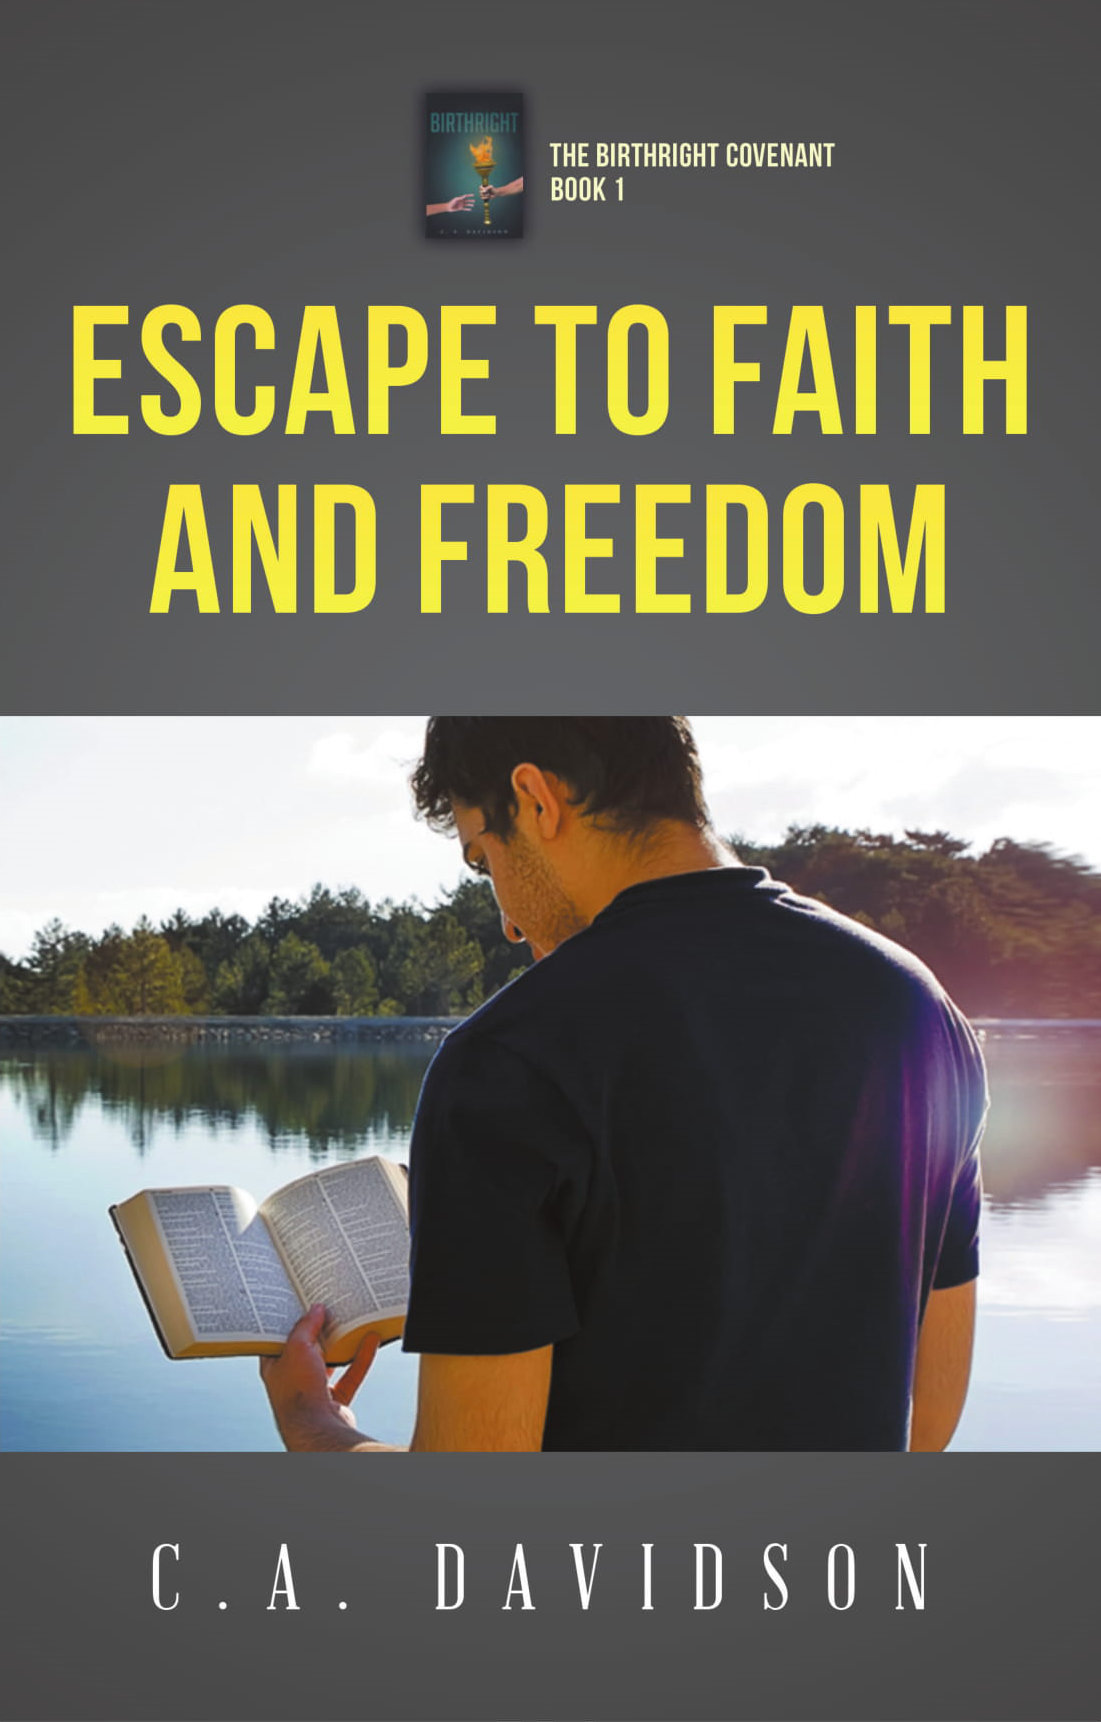 C.A. Davidson - Escape to Faith and Freedom